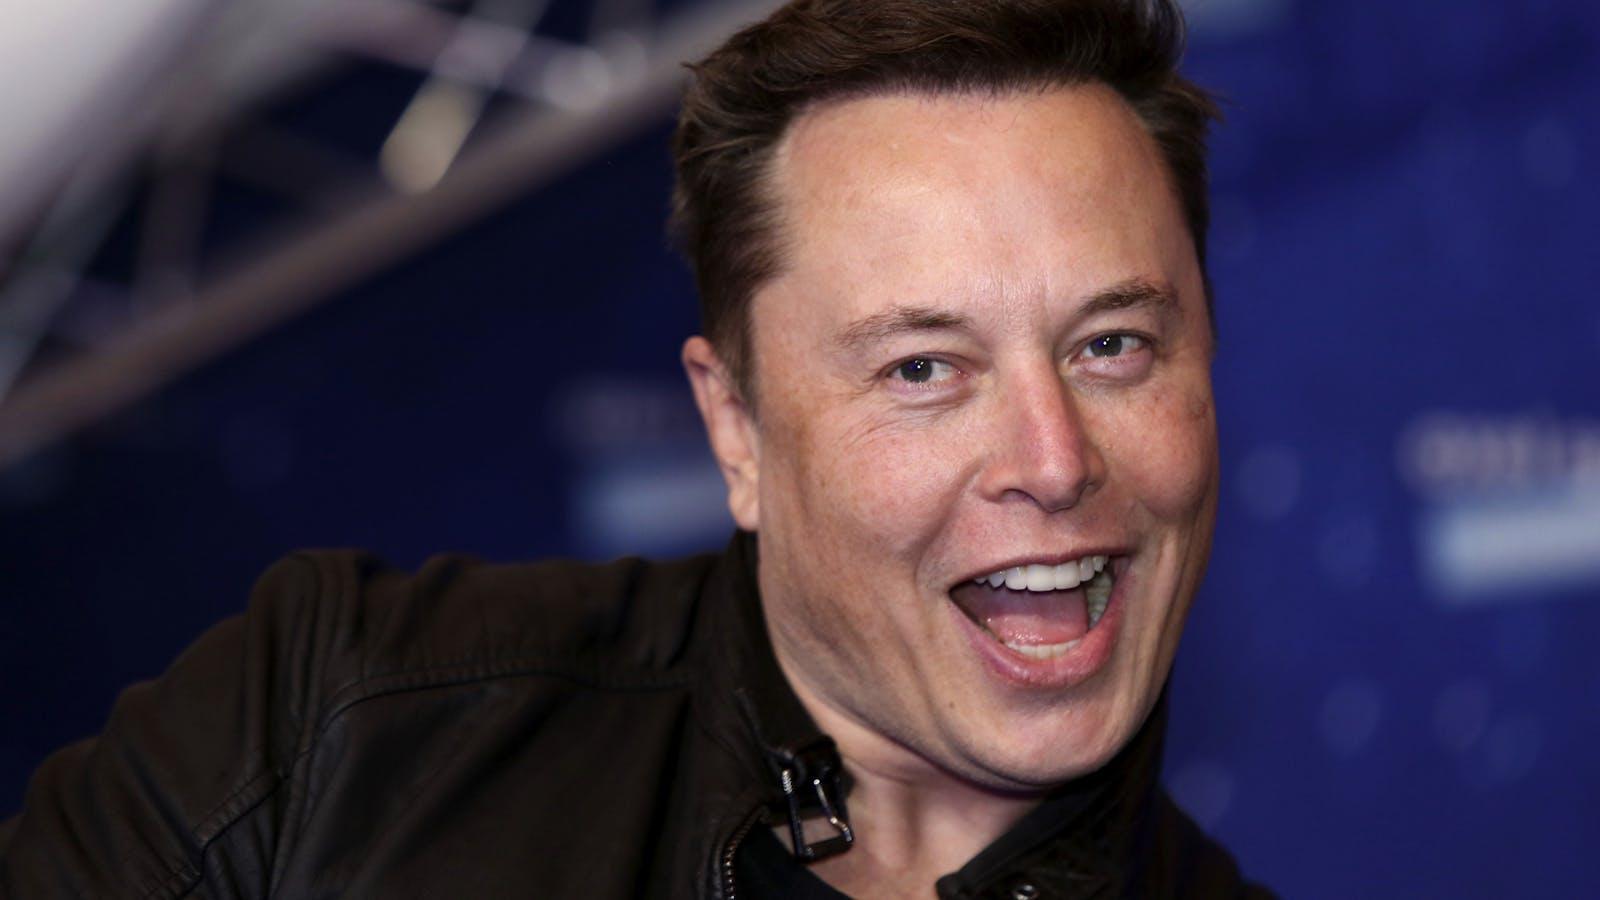 Elon Musk. Photo by Bloomberg